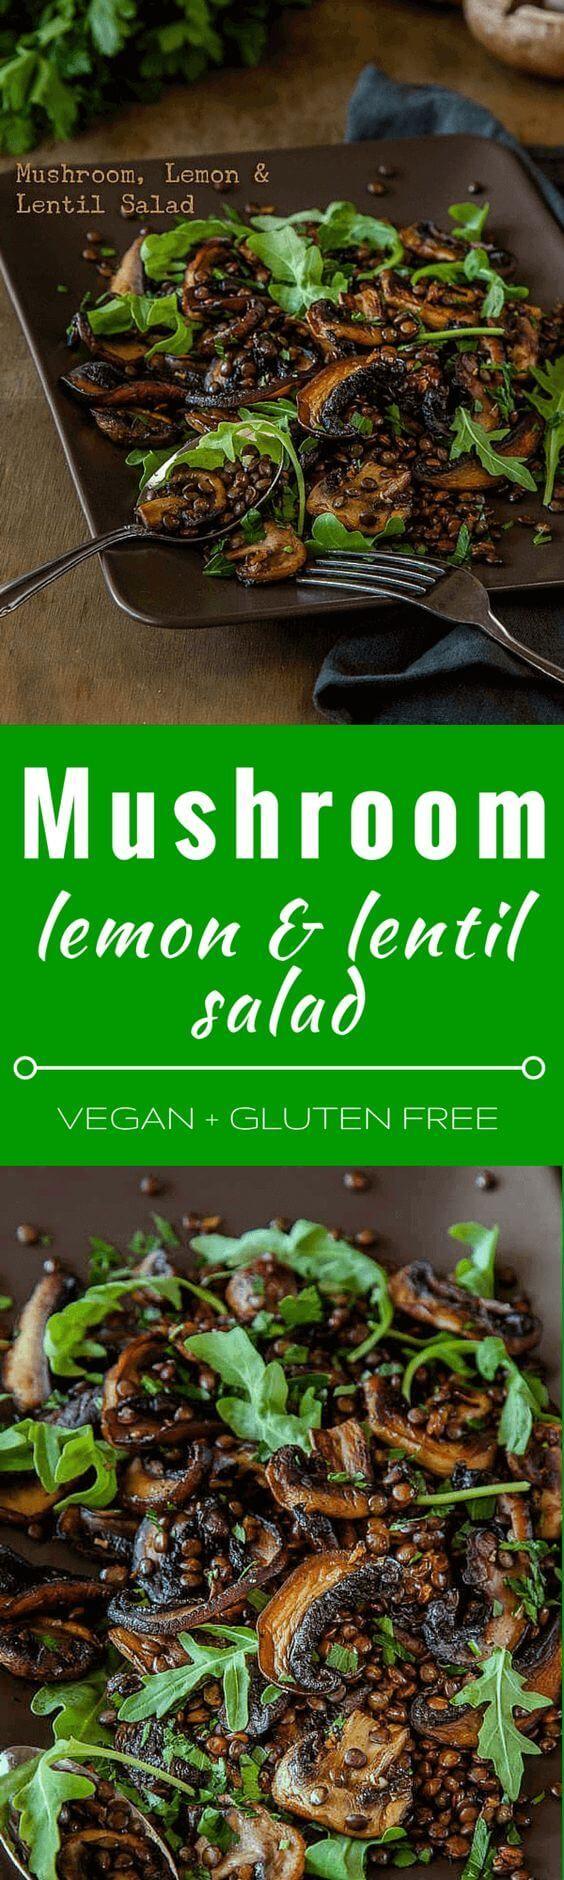 awesome Mushroom, Lemon and Lentil Salad